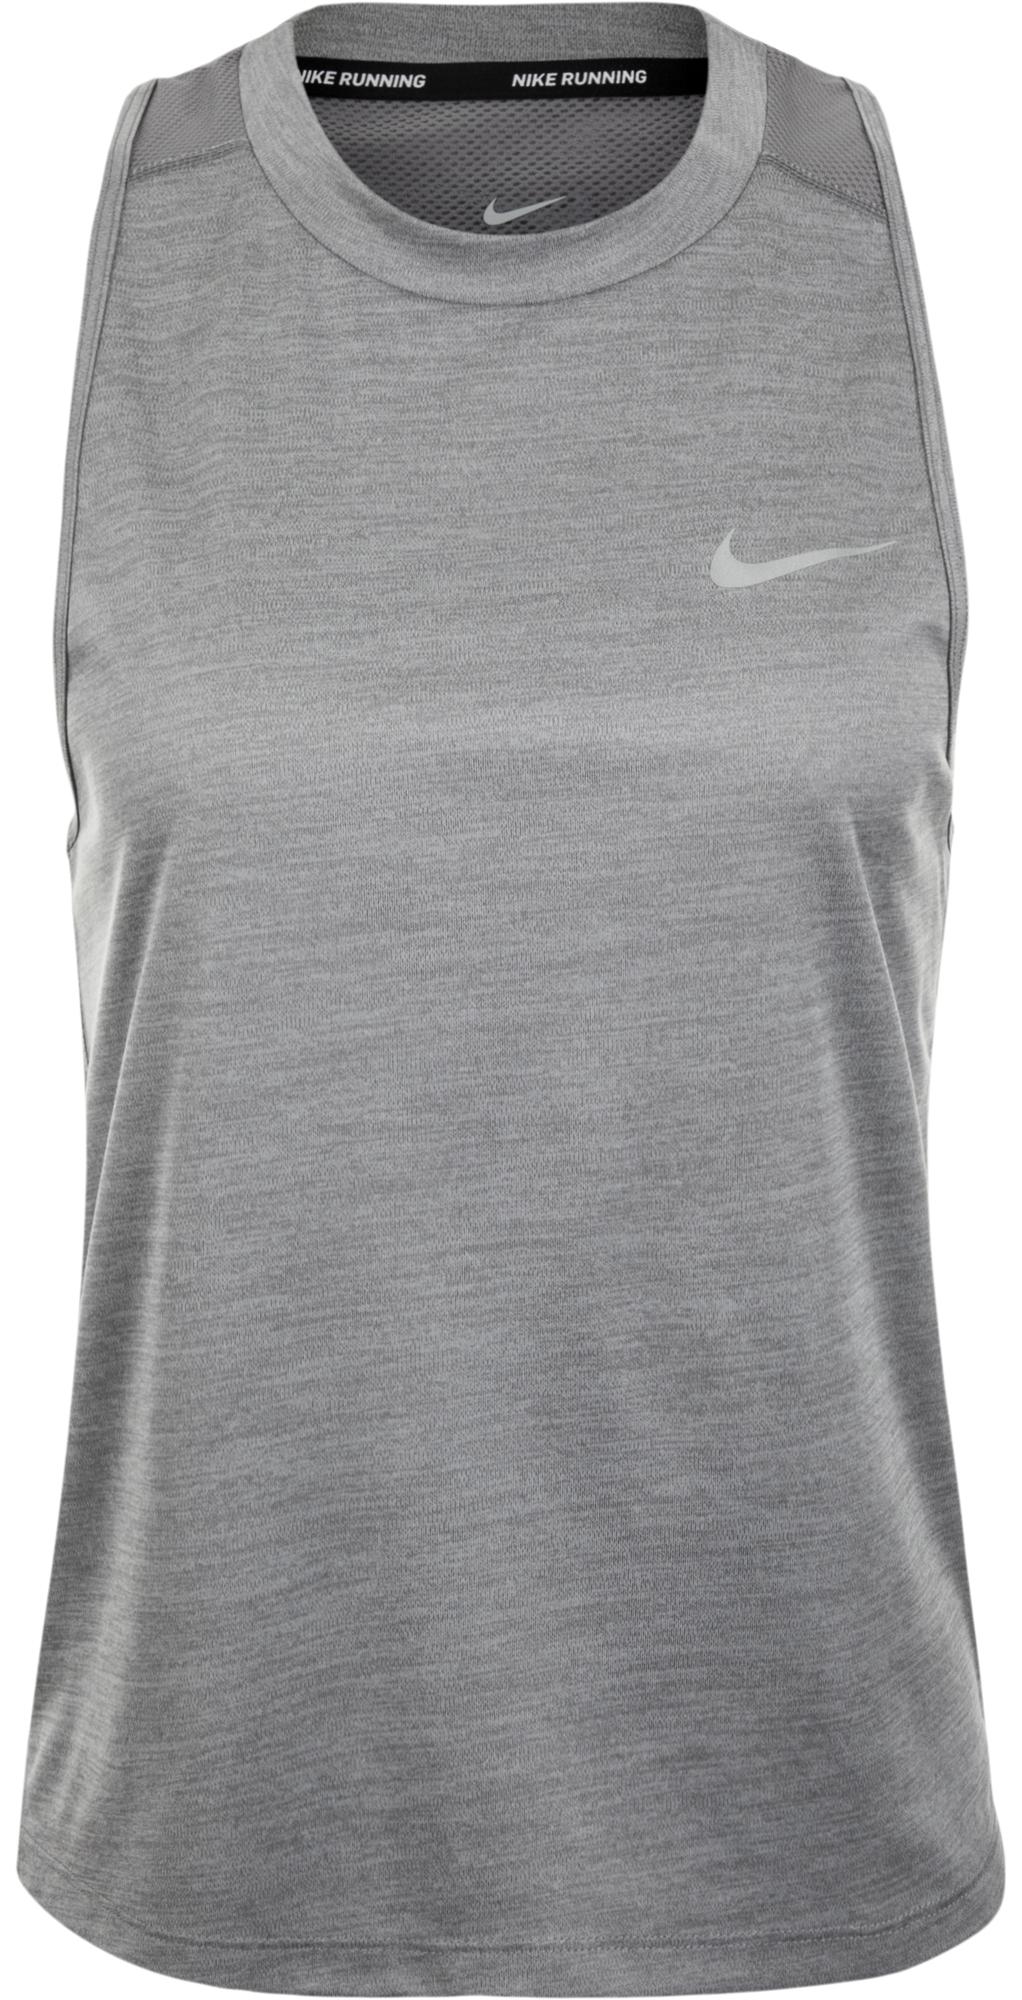 Nike Майка женская Nike Miler, размер 46-48 nike футболка женская nike miler размер 42 44